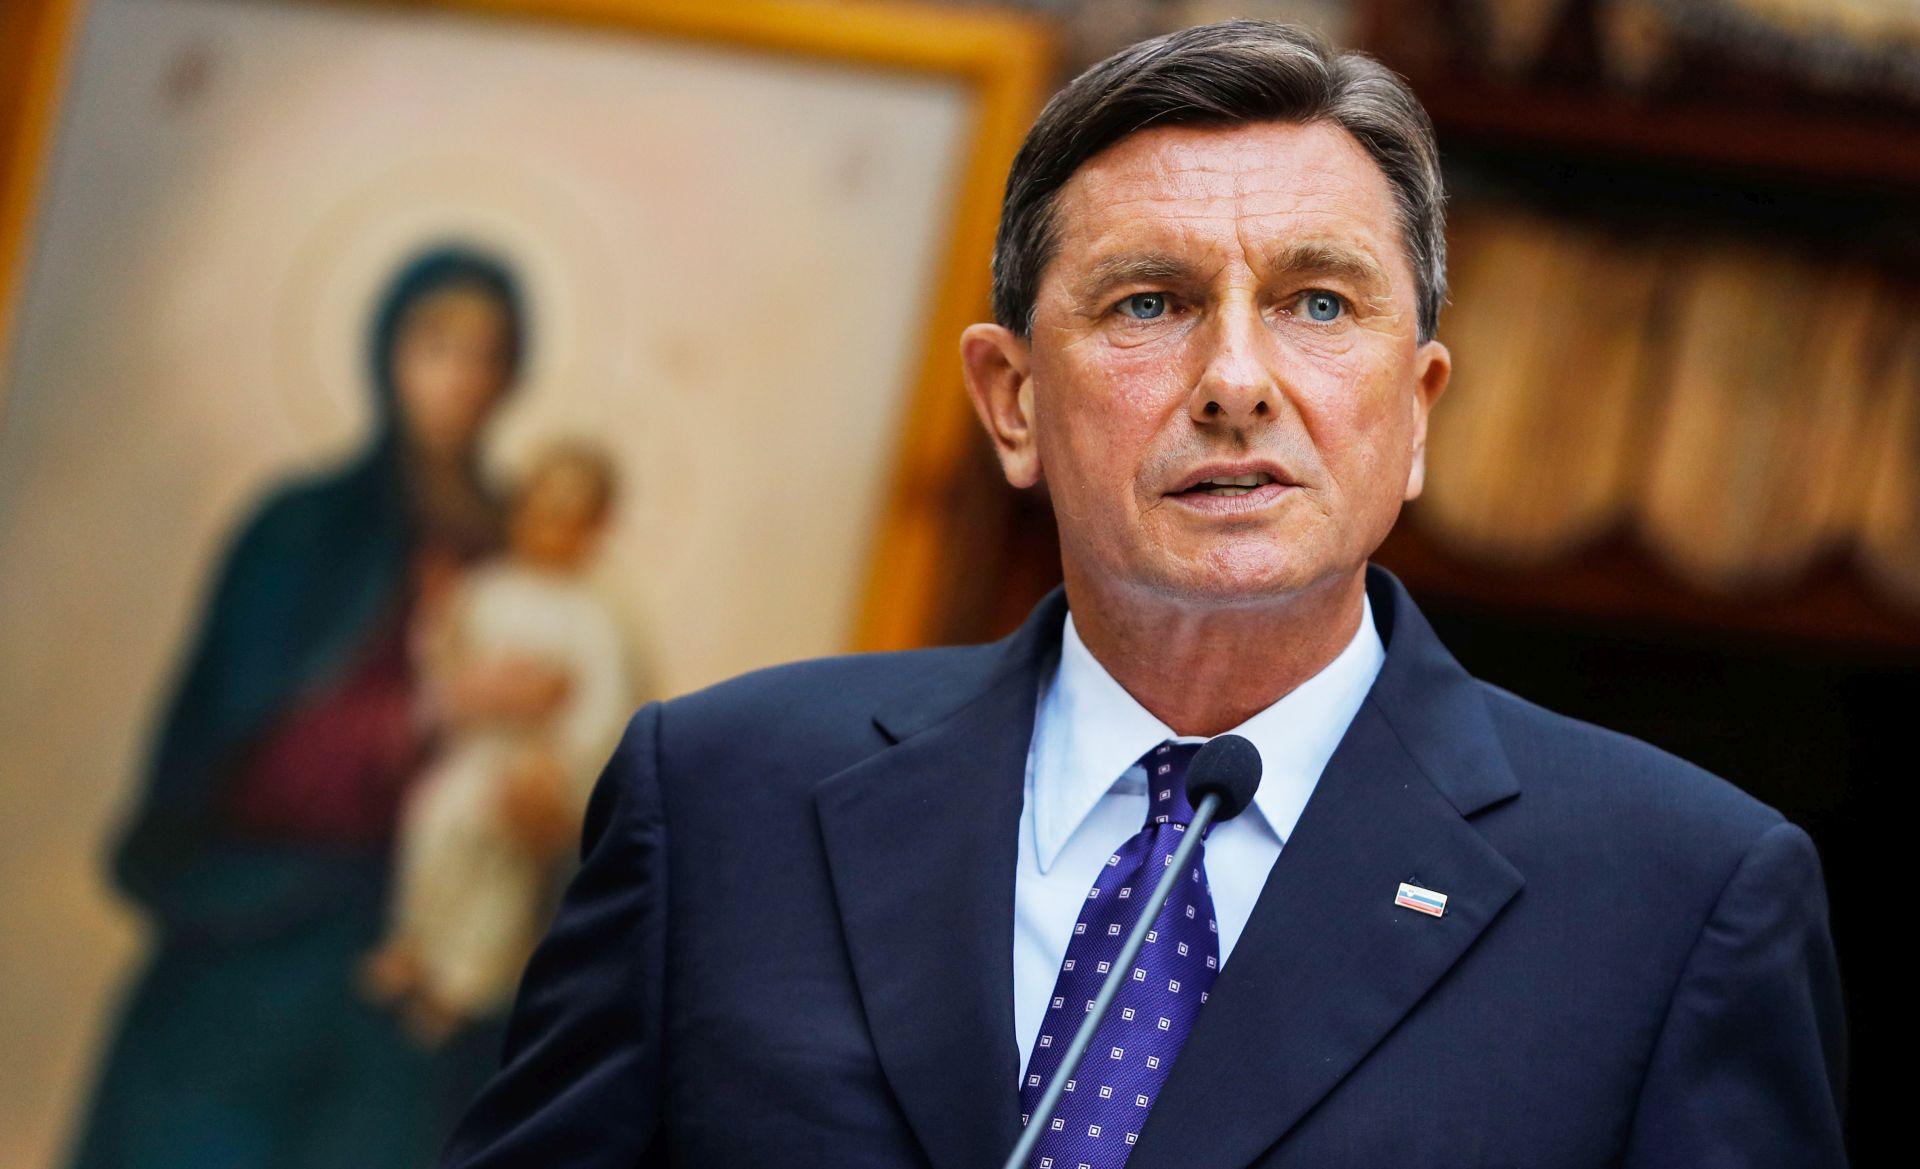 ANKETA Pahoru se smiješi drugi mandat slovenskog predsjednika